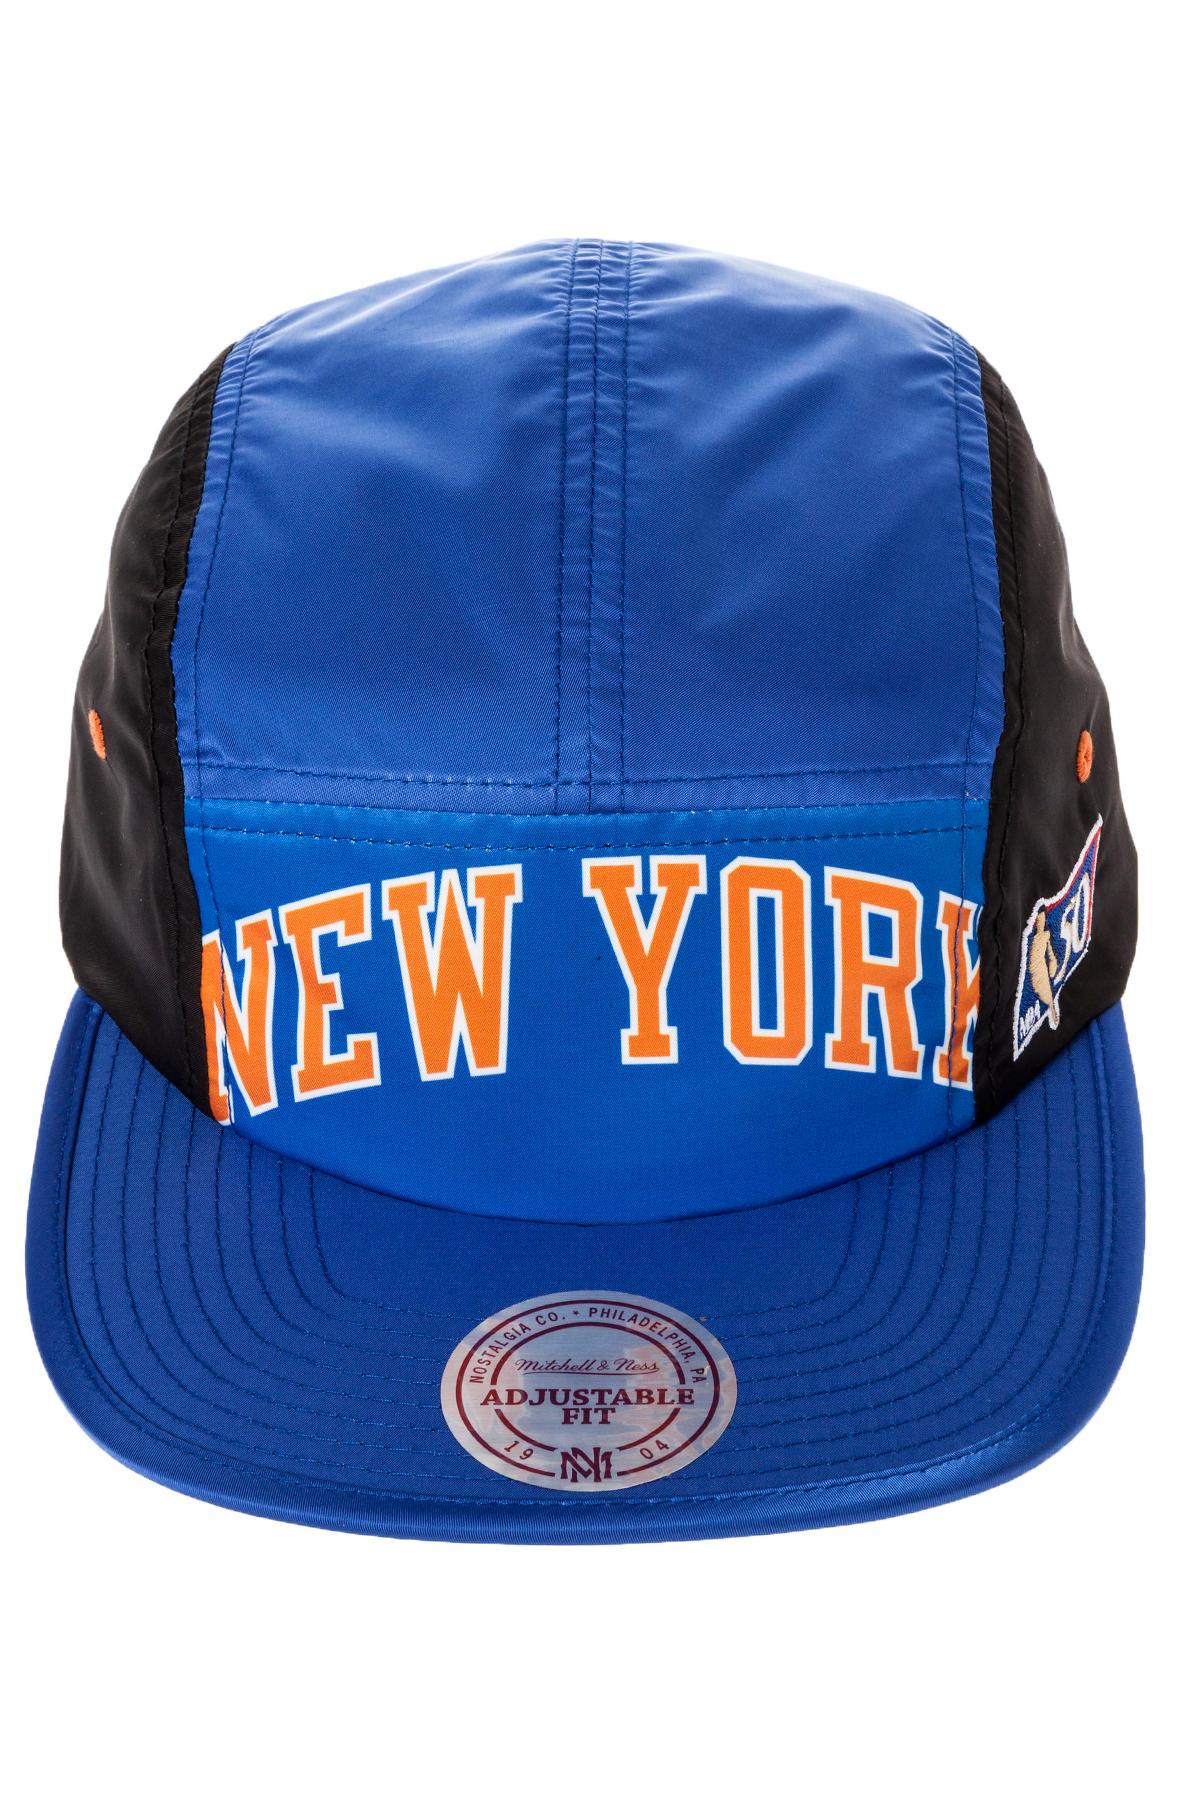 32063541d31 ... germany lyst mitchell ness the new york knicks wordmark 5panel cap in  8602f b8444